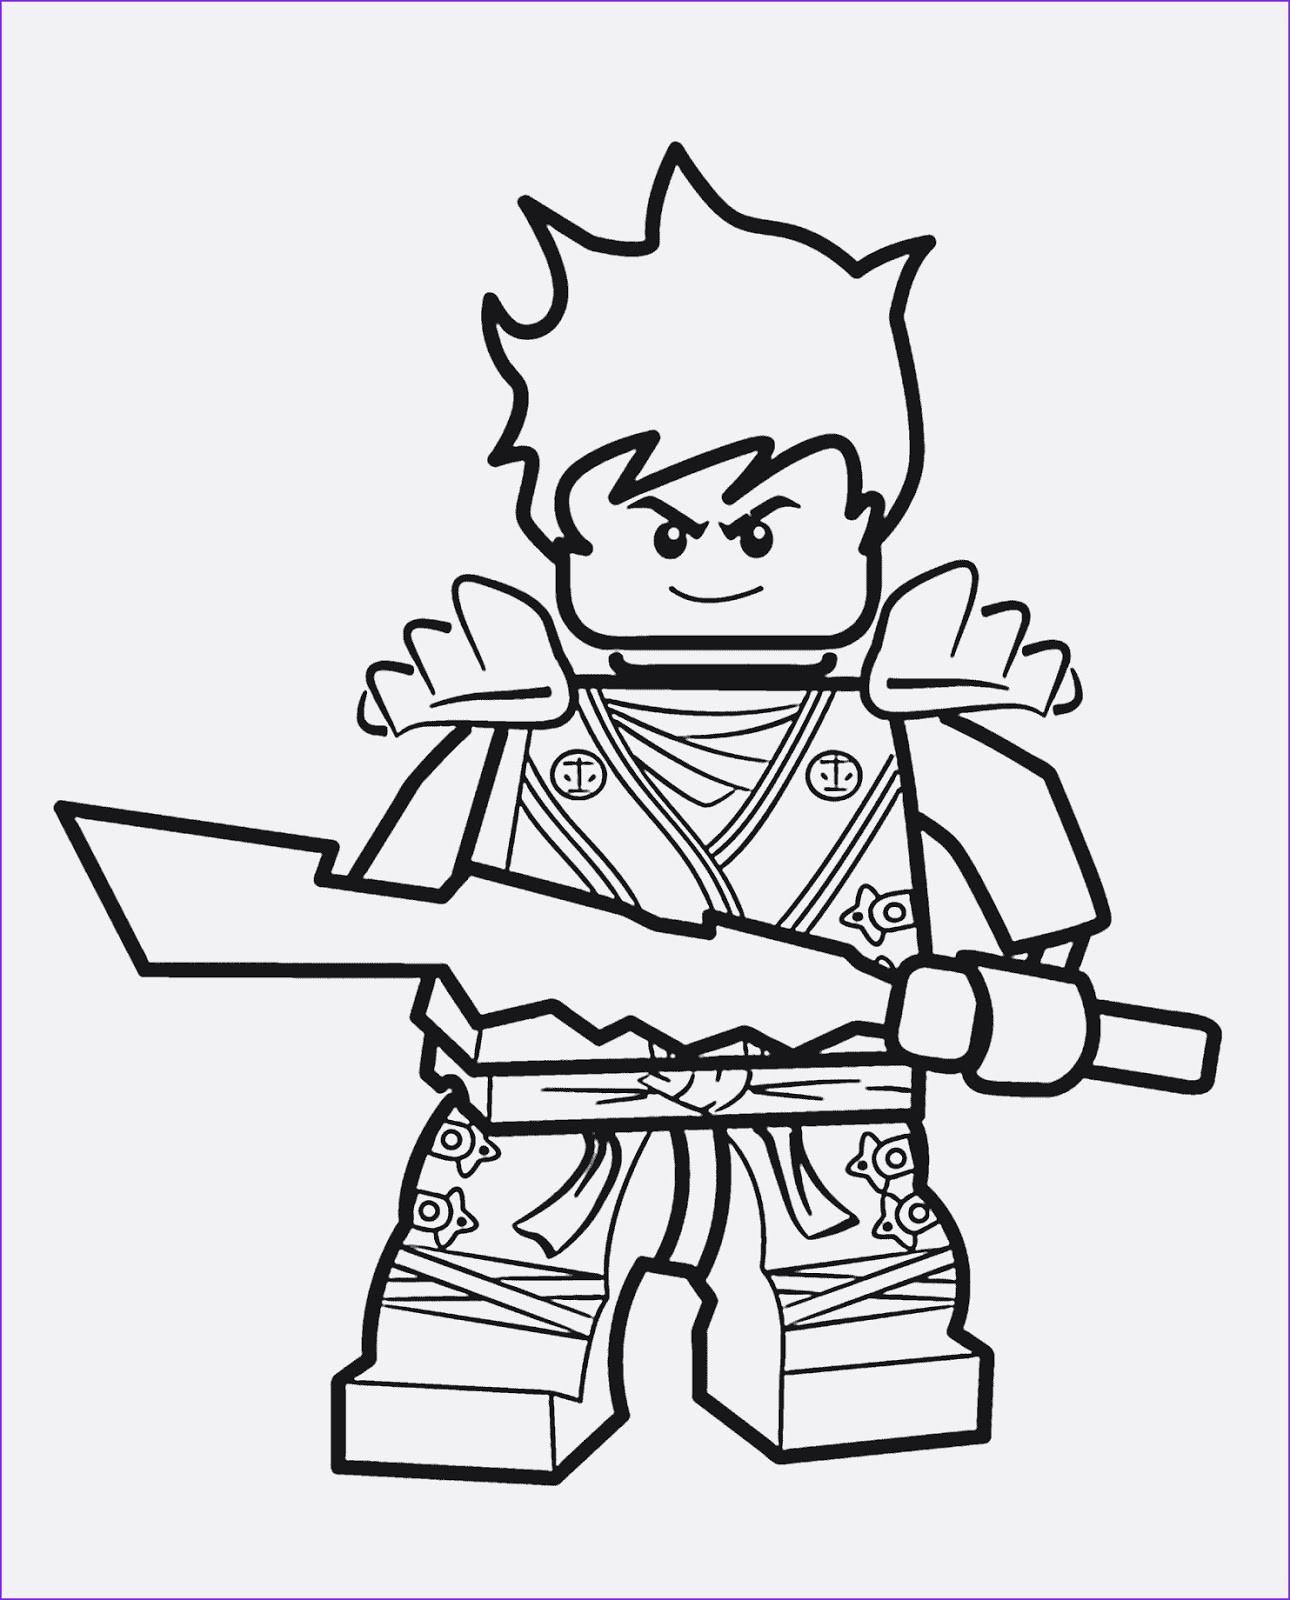 Lego Ausmalbilder Ninjago  Ausmalbilder Lego Ninjago Lego Ninjago zum Ausmalen